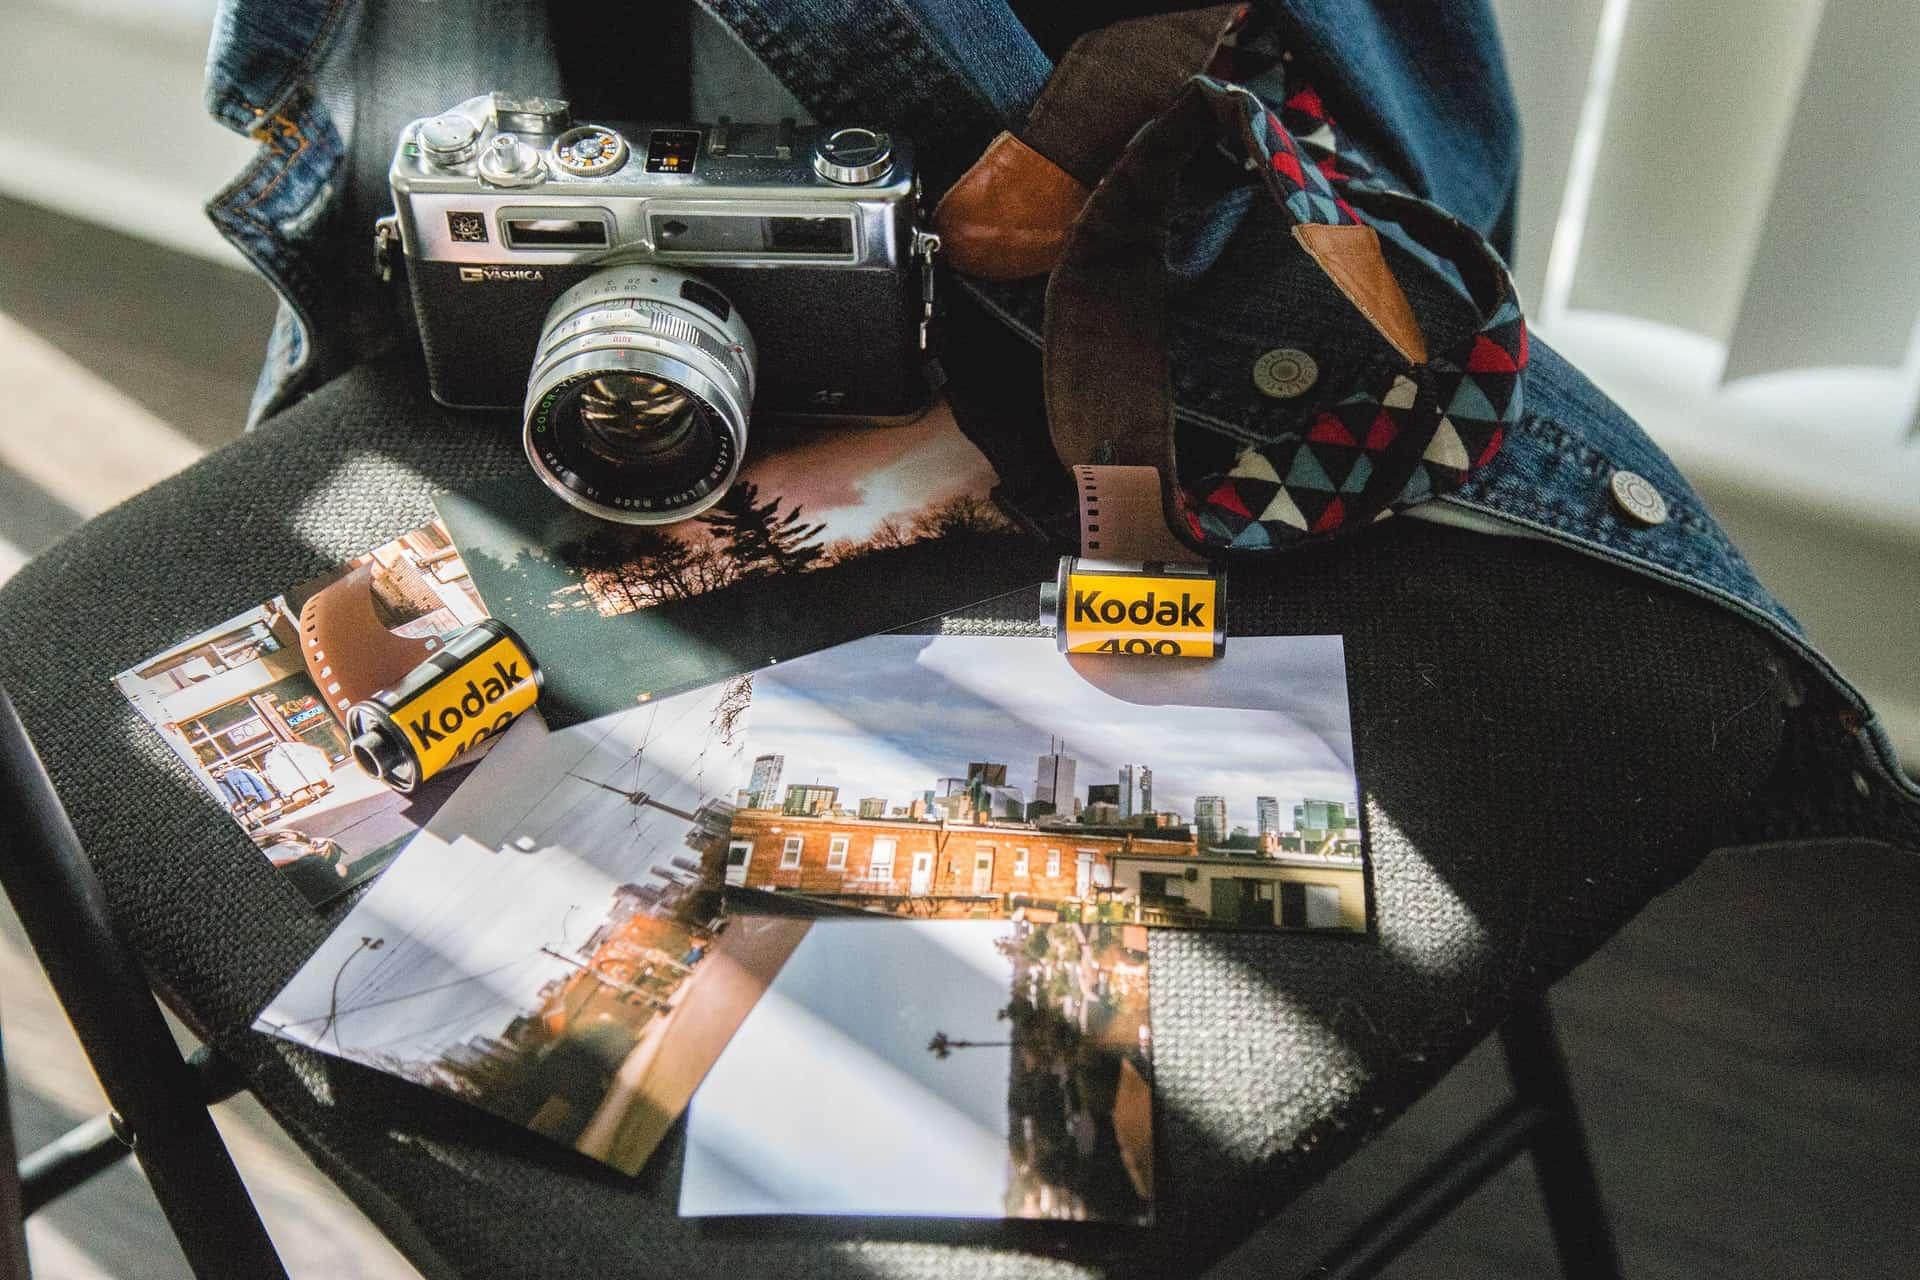 Kodac digital photo frames